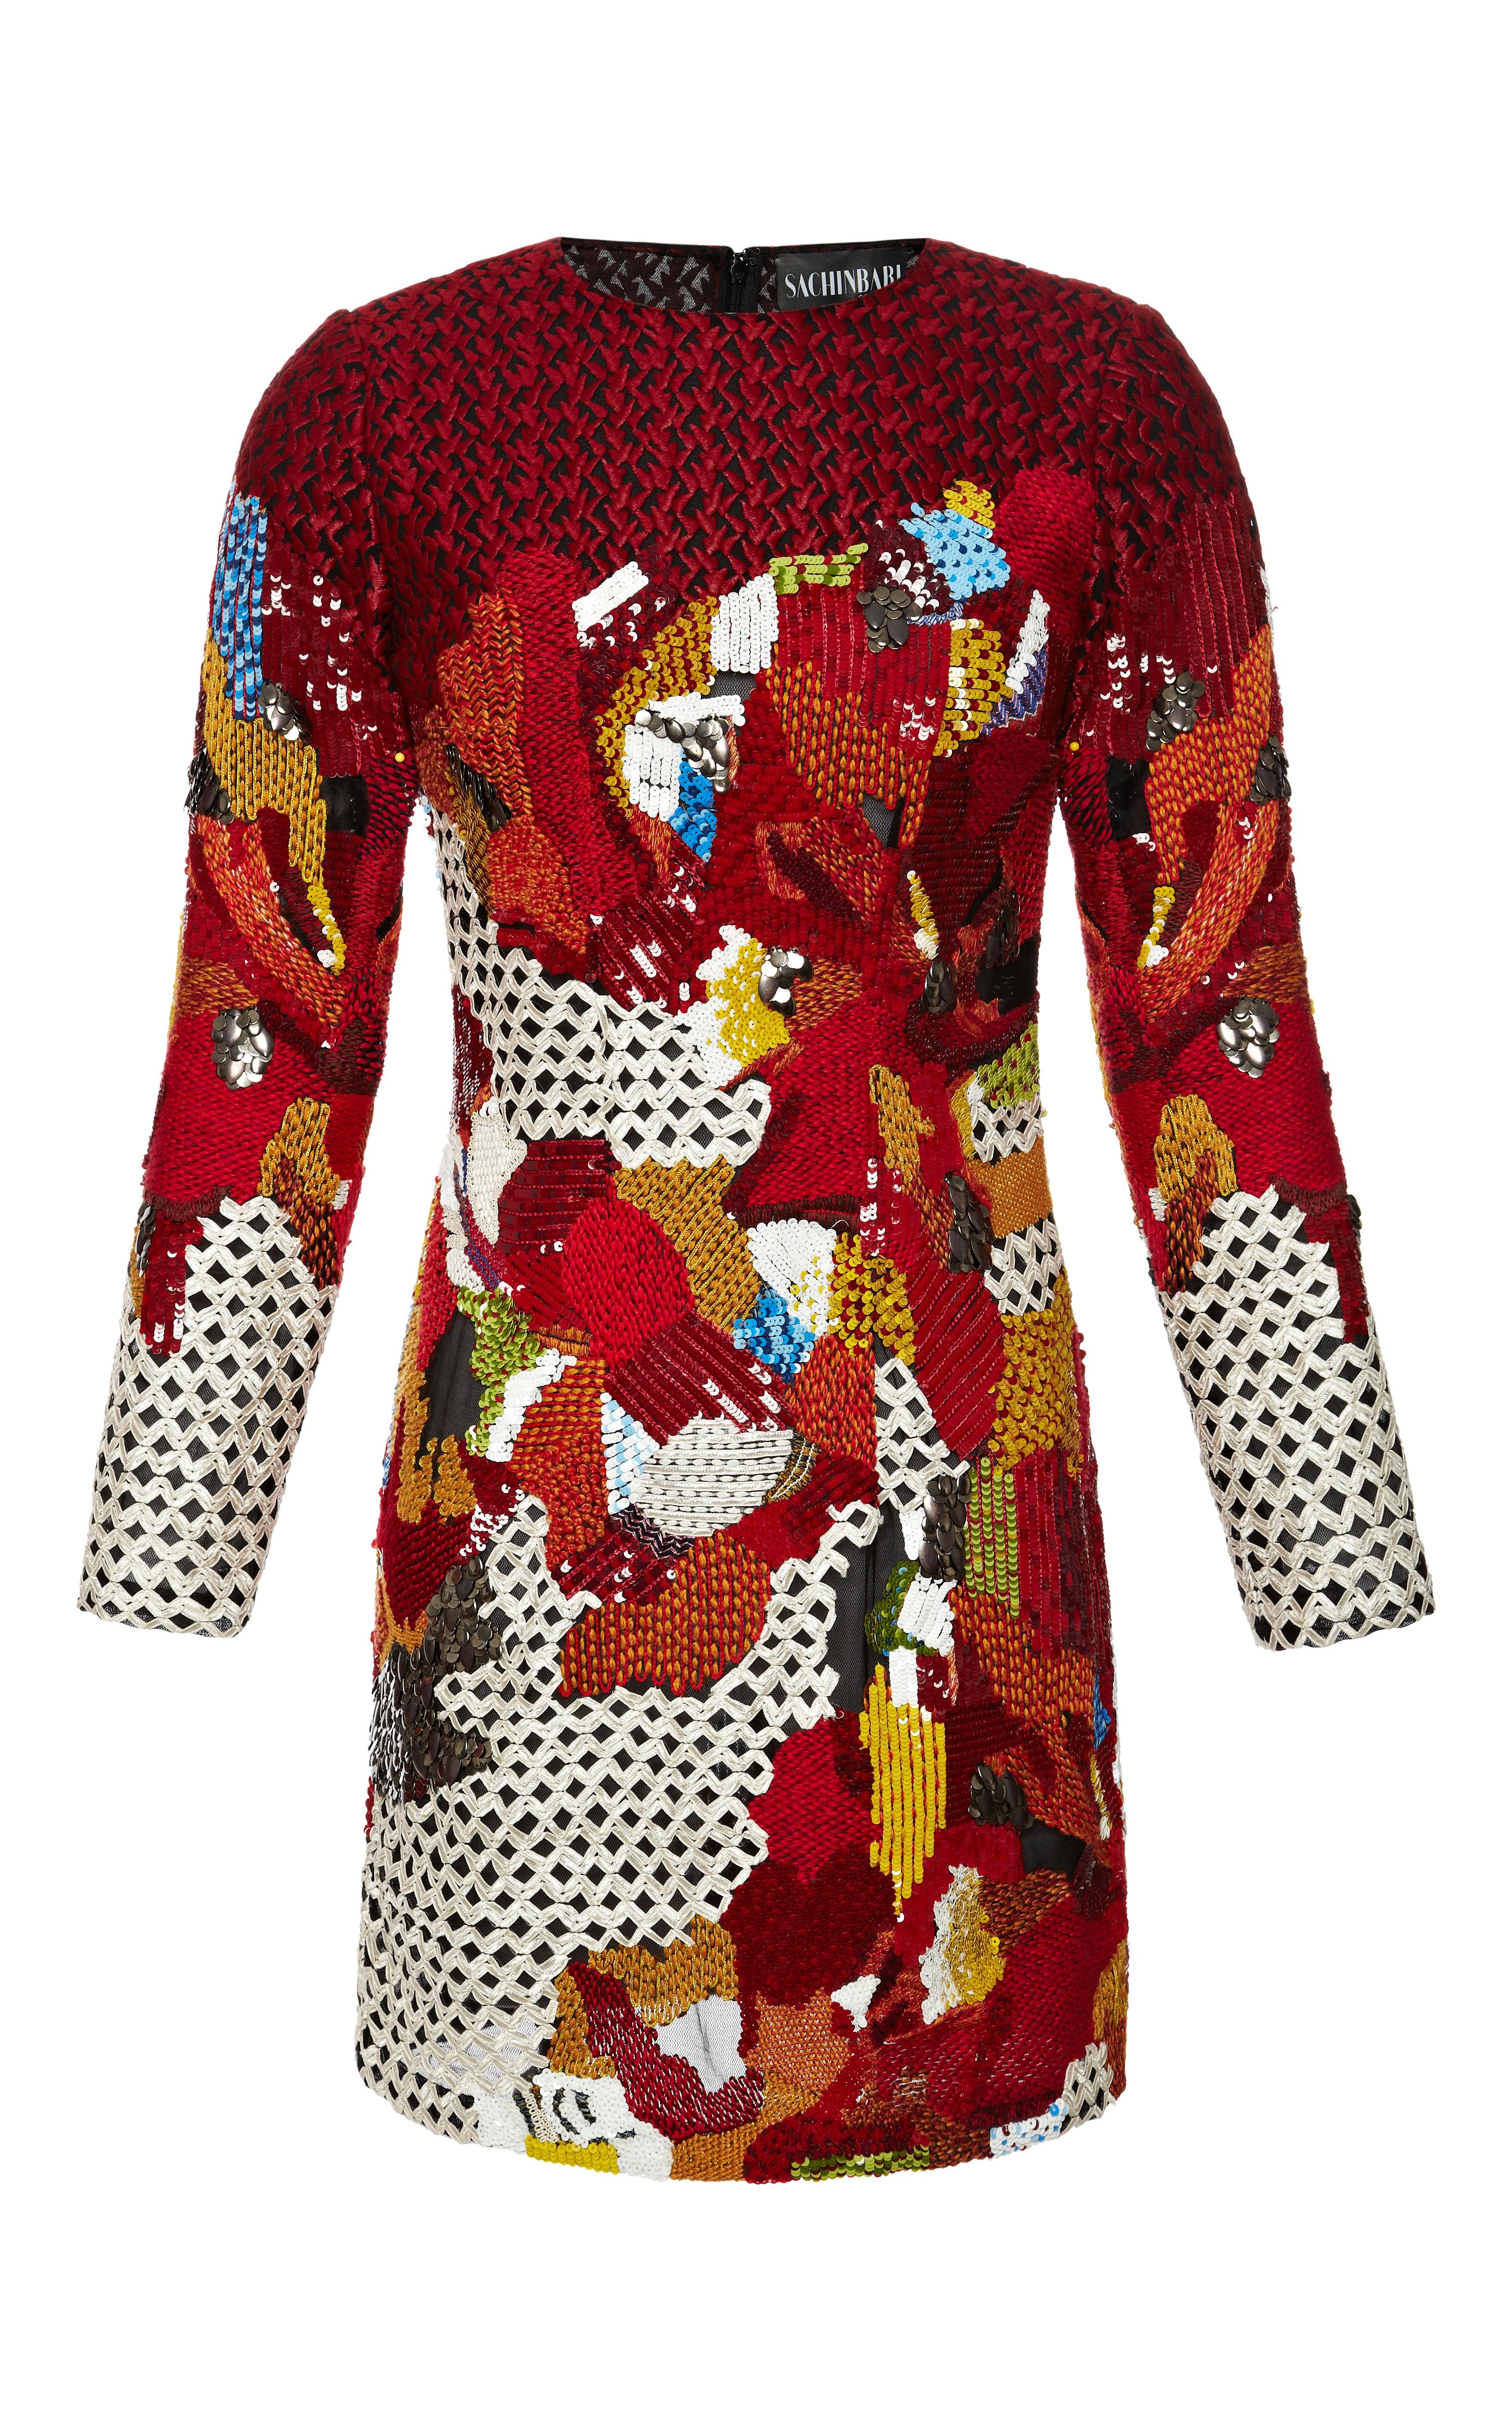 Sachinbabi collection long sleeve embroidered dress by sachin babi